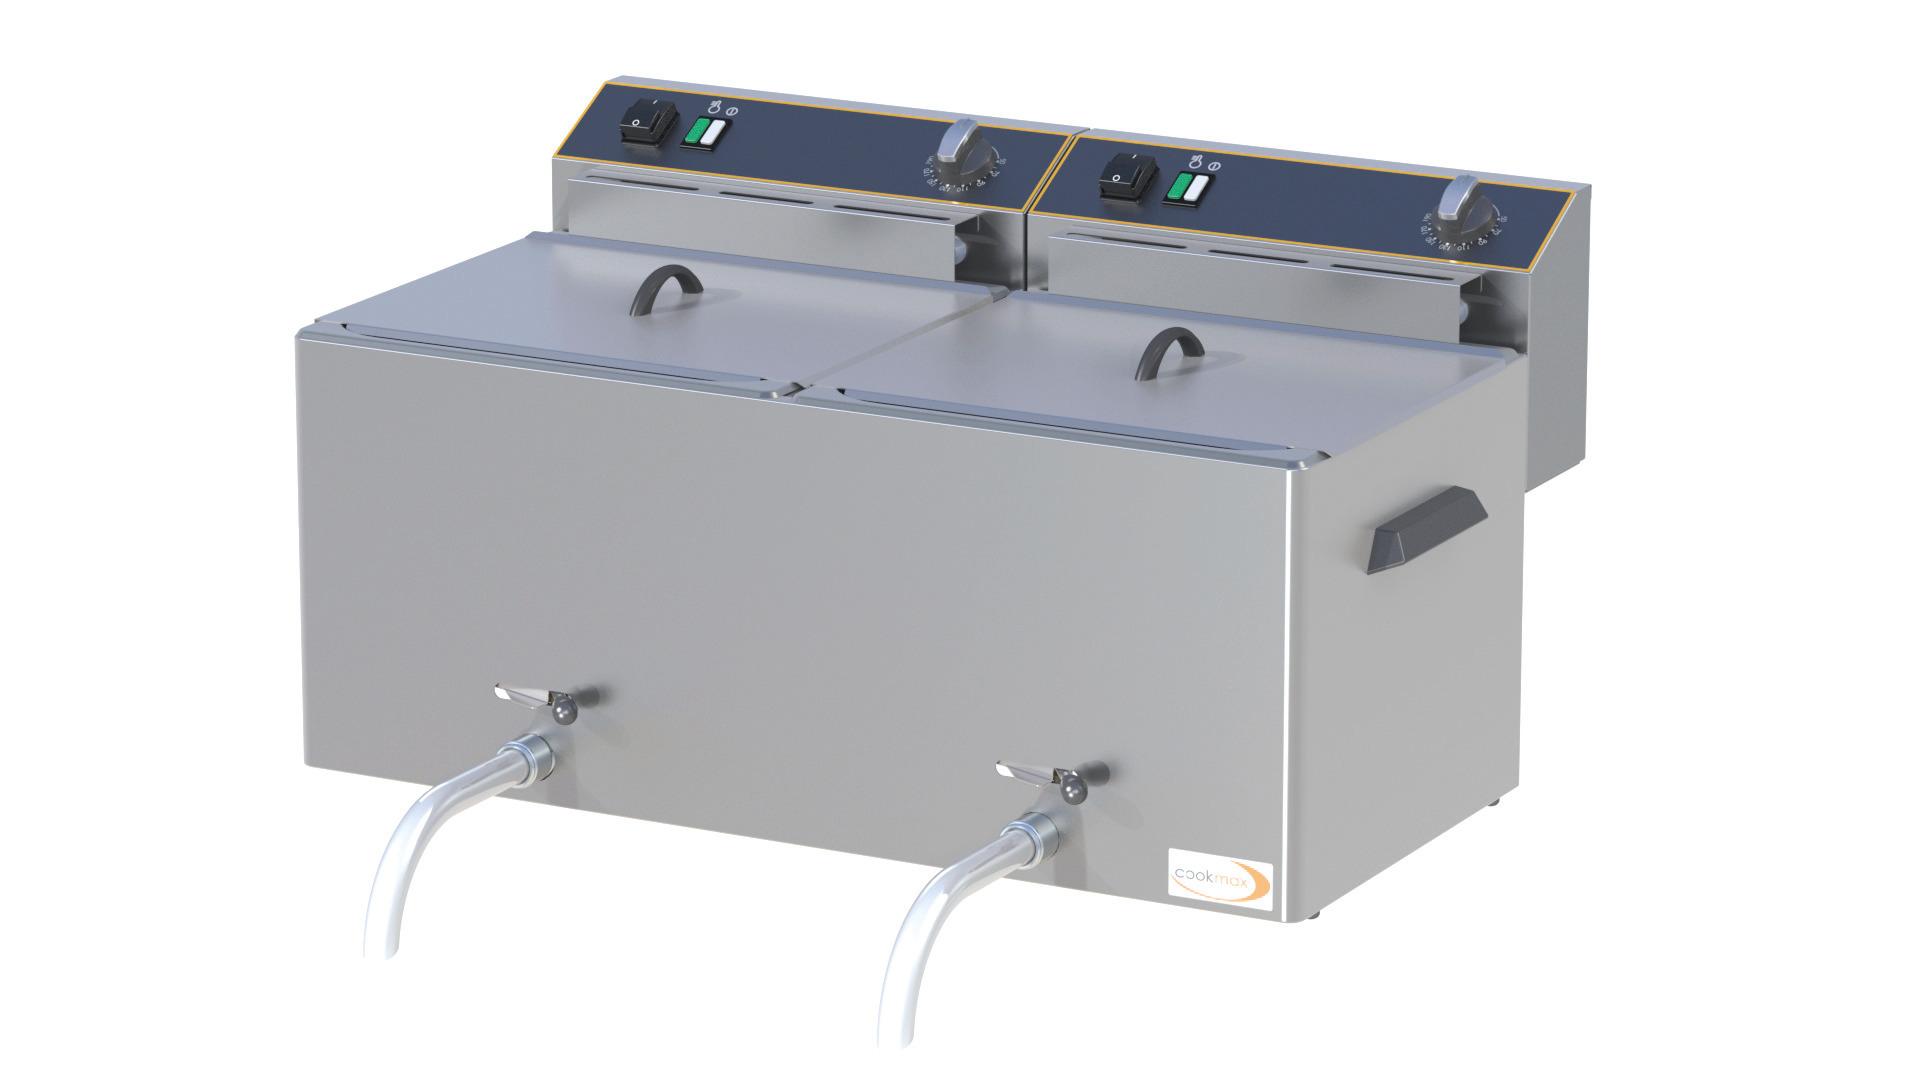 Elektro-Fritteuse, 2x 10 l, mit Ablasshahn